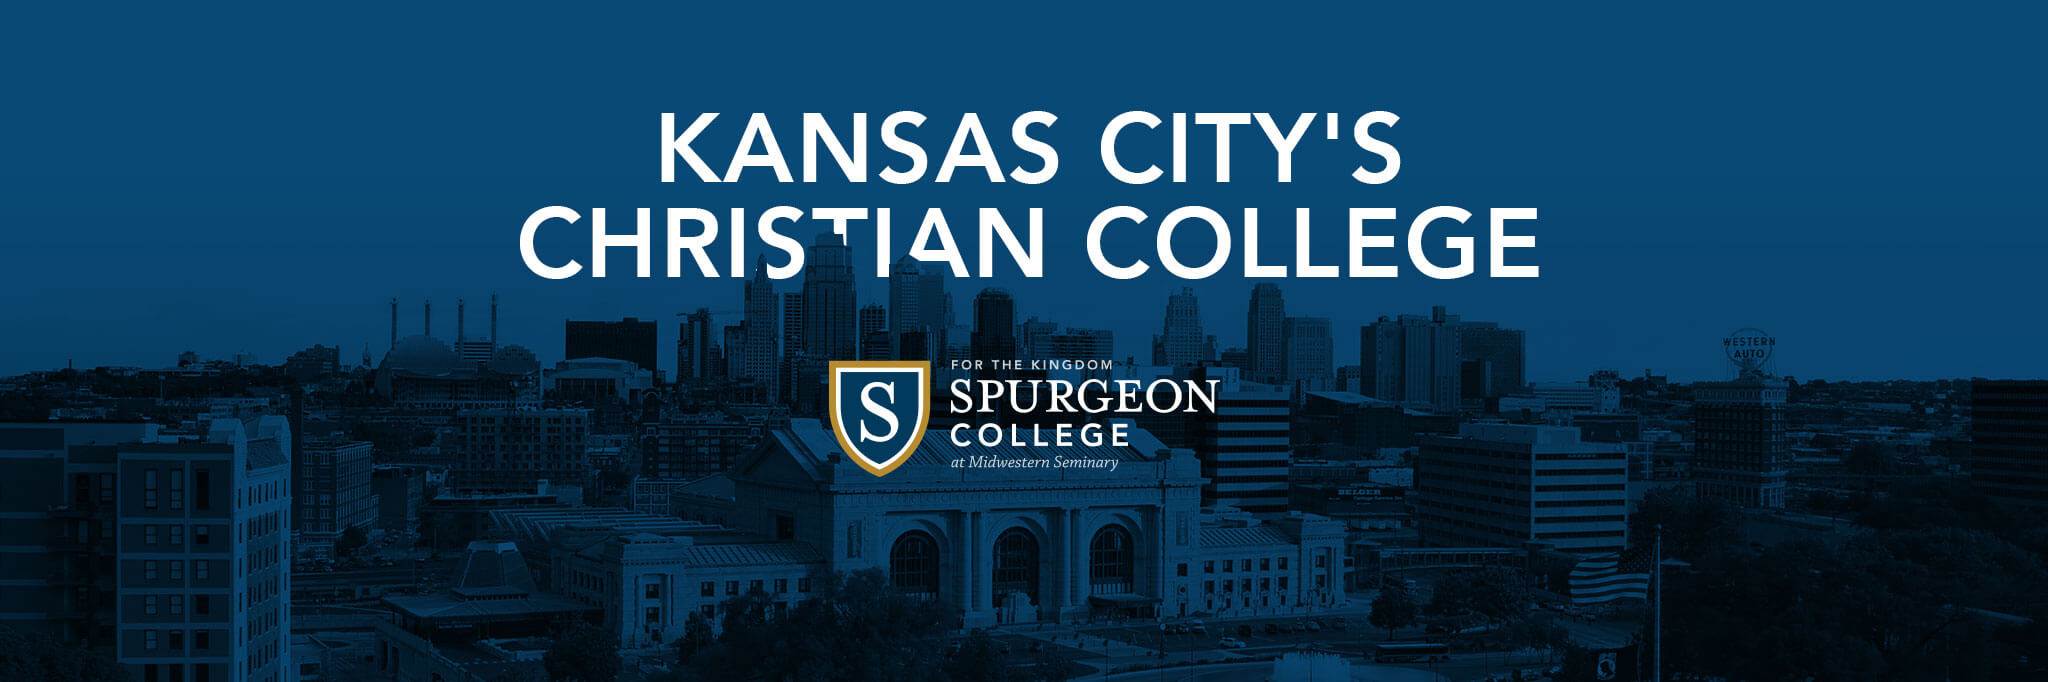 Kansas City's Christian College - Spurgeon College